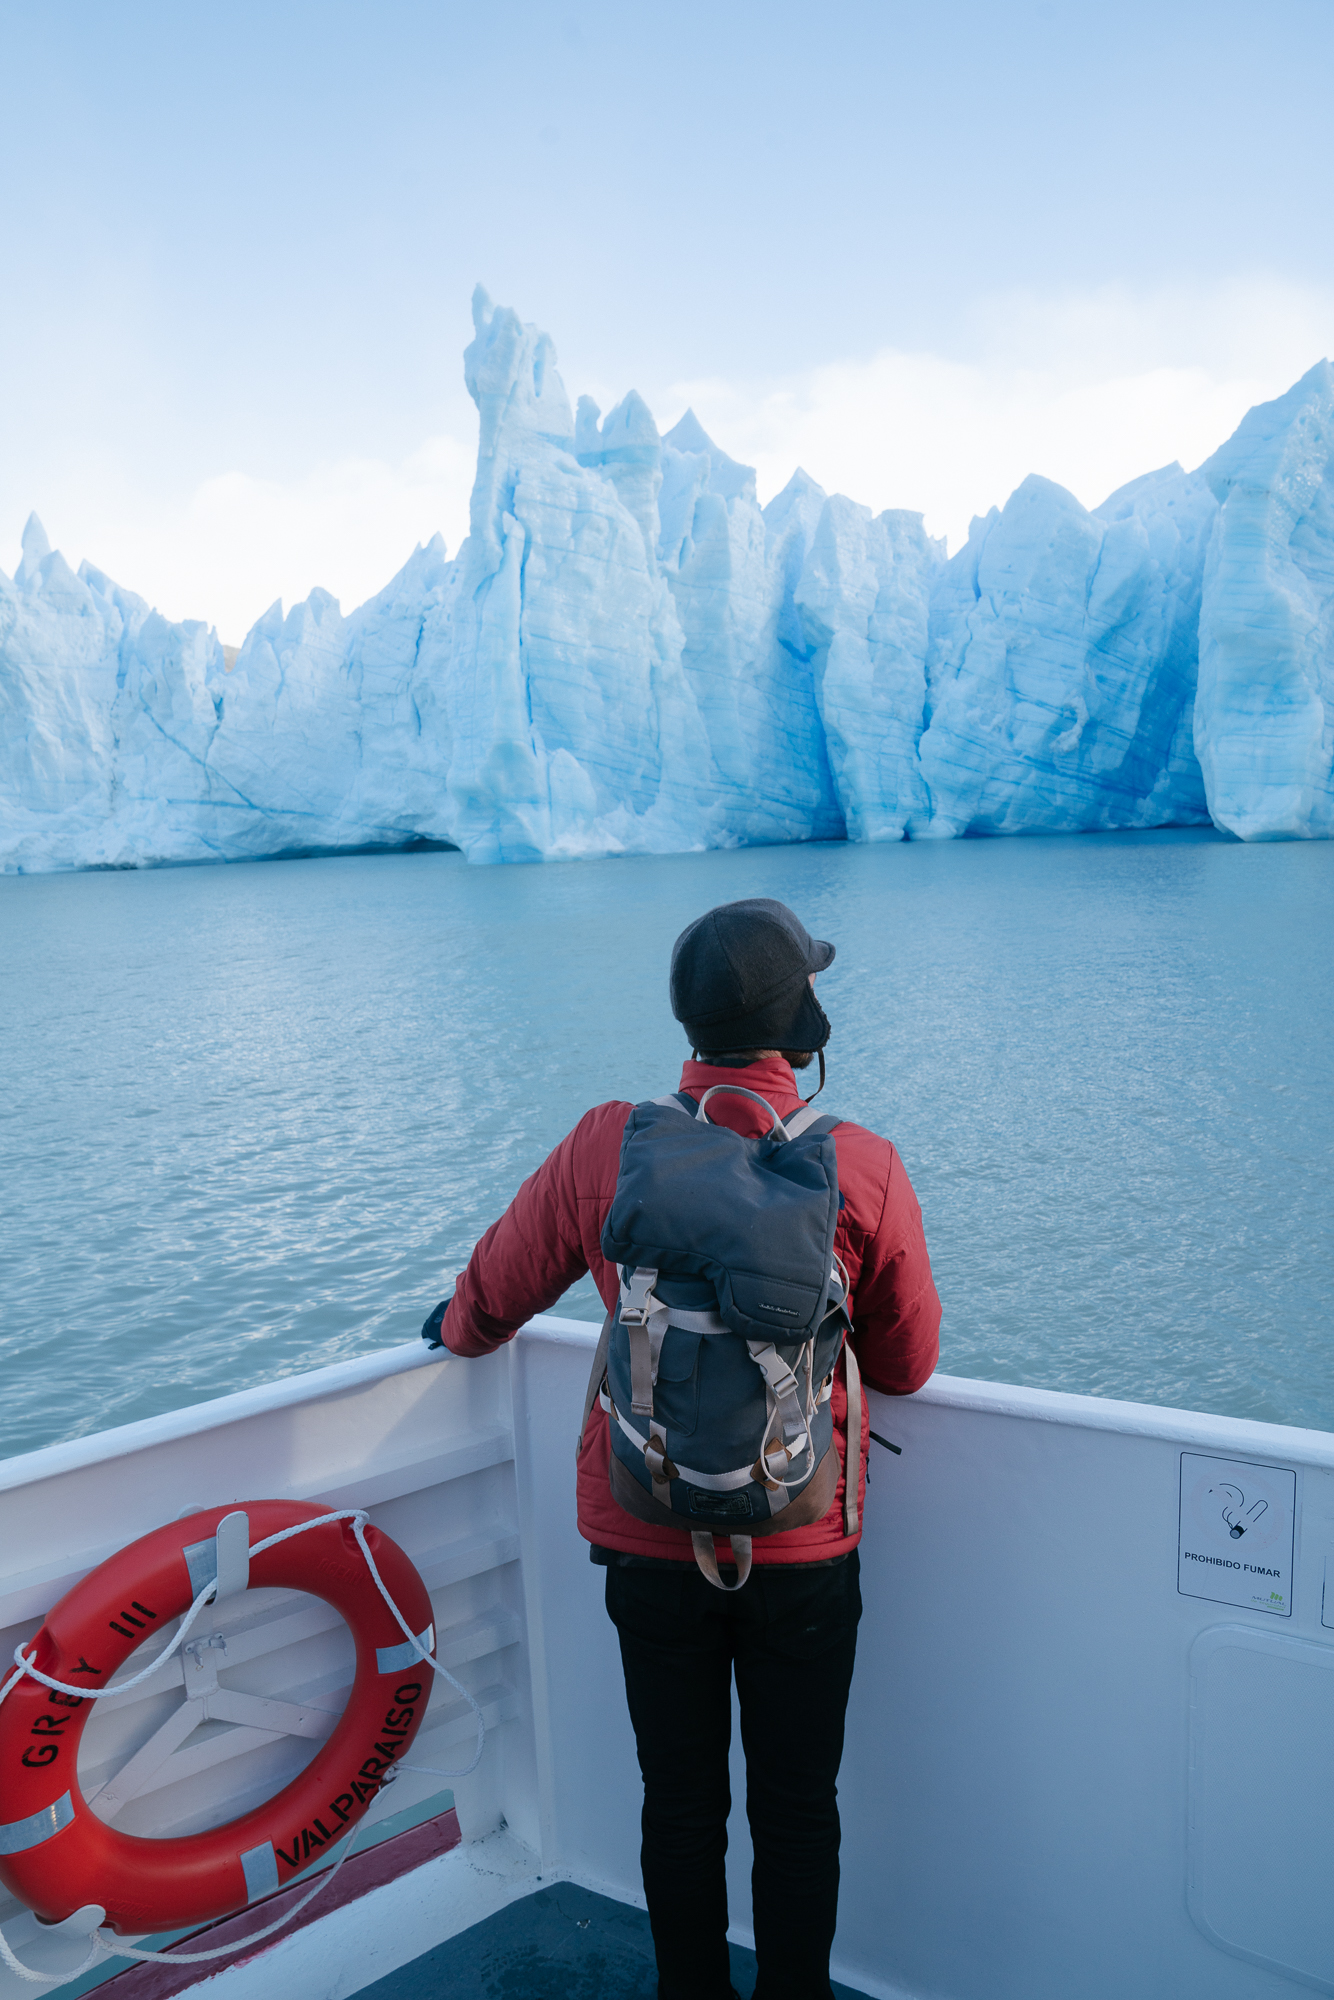 chs0030_saphire seven_patagonia_glacier-73.jpg